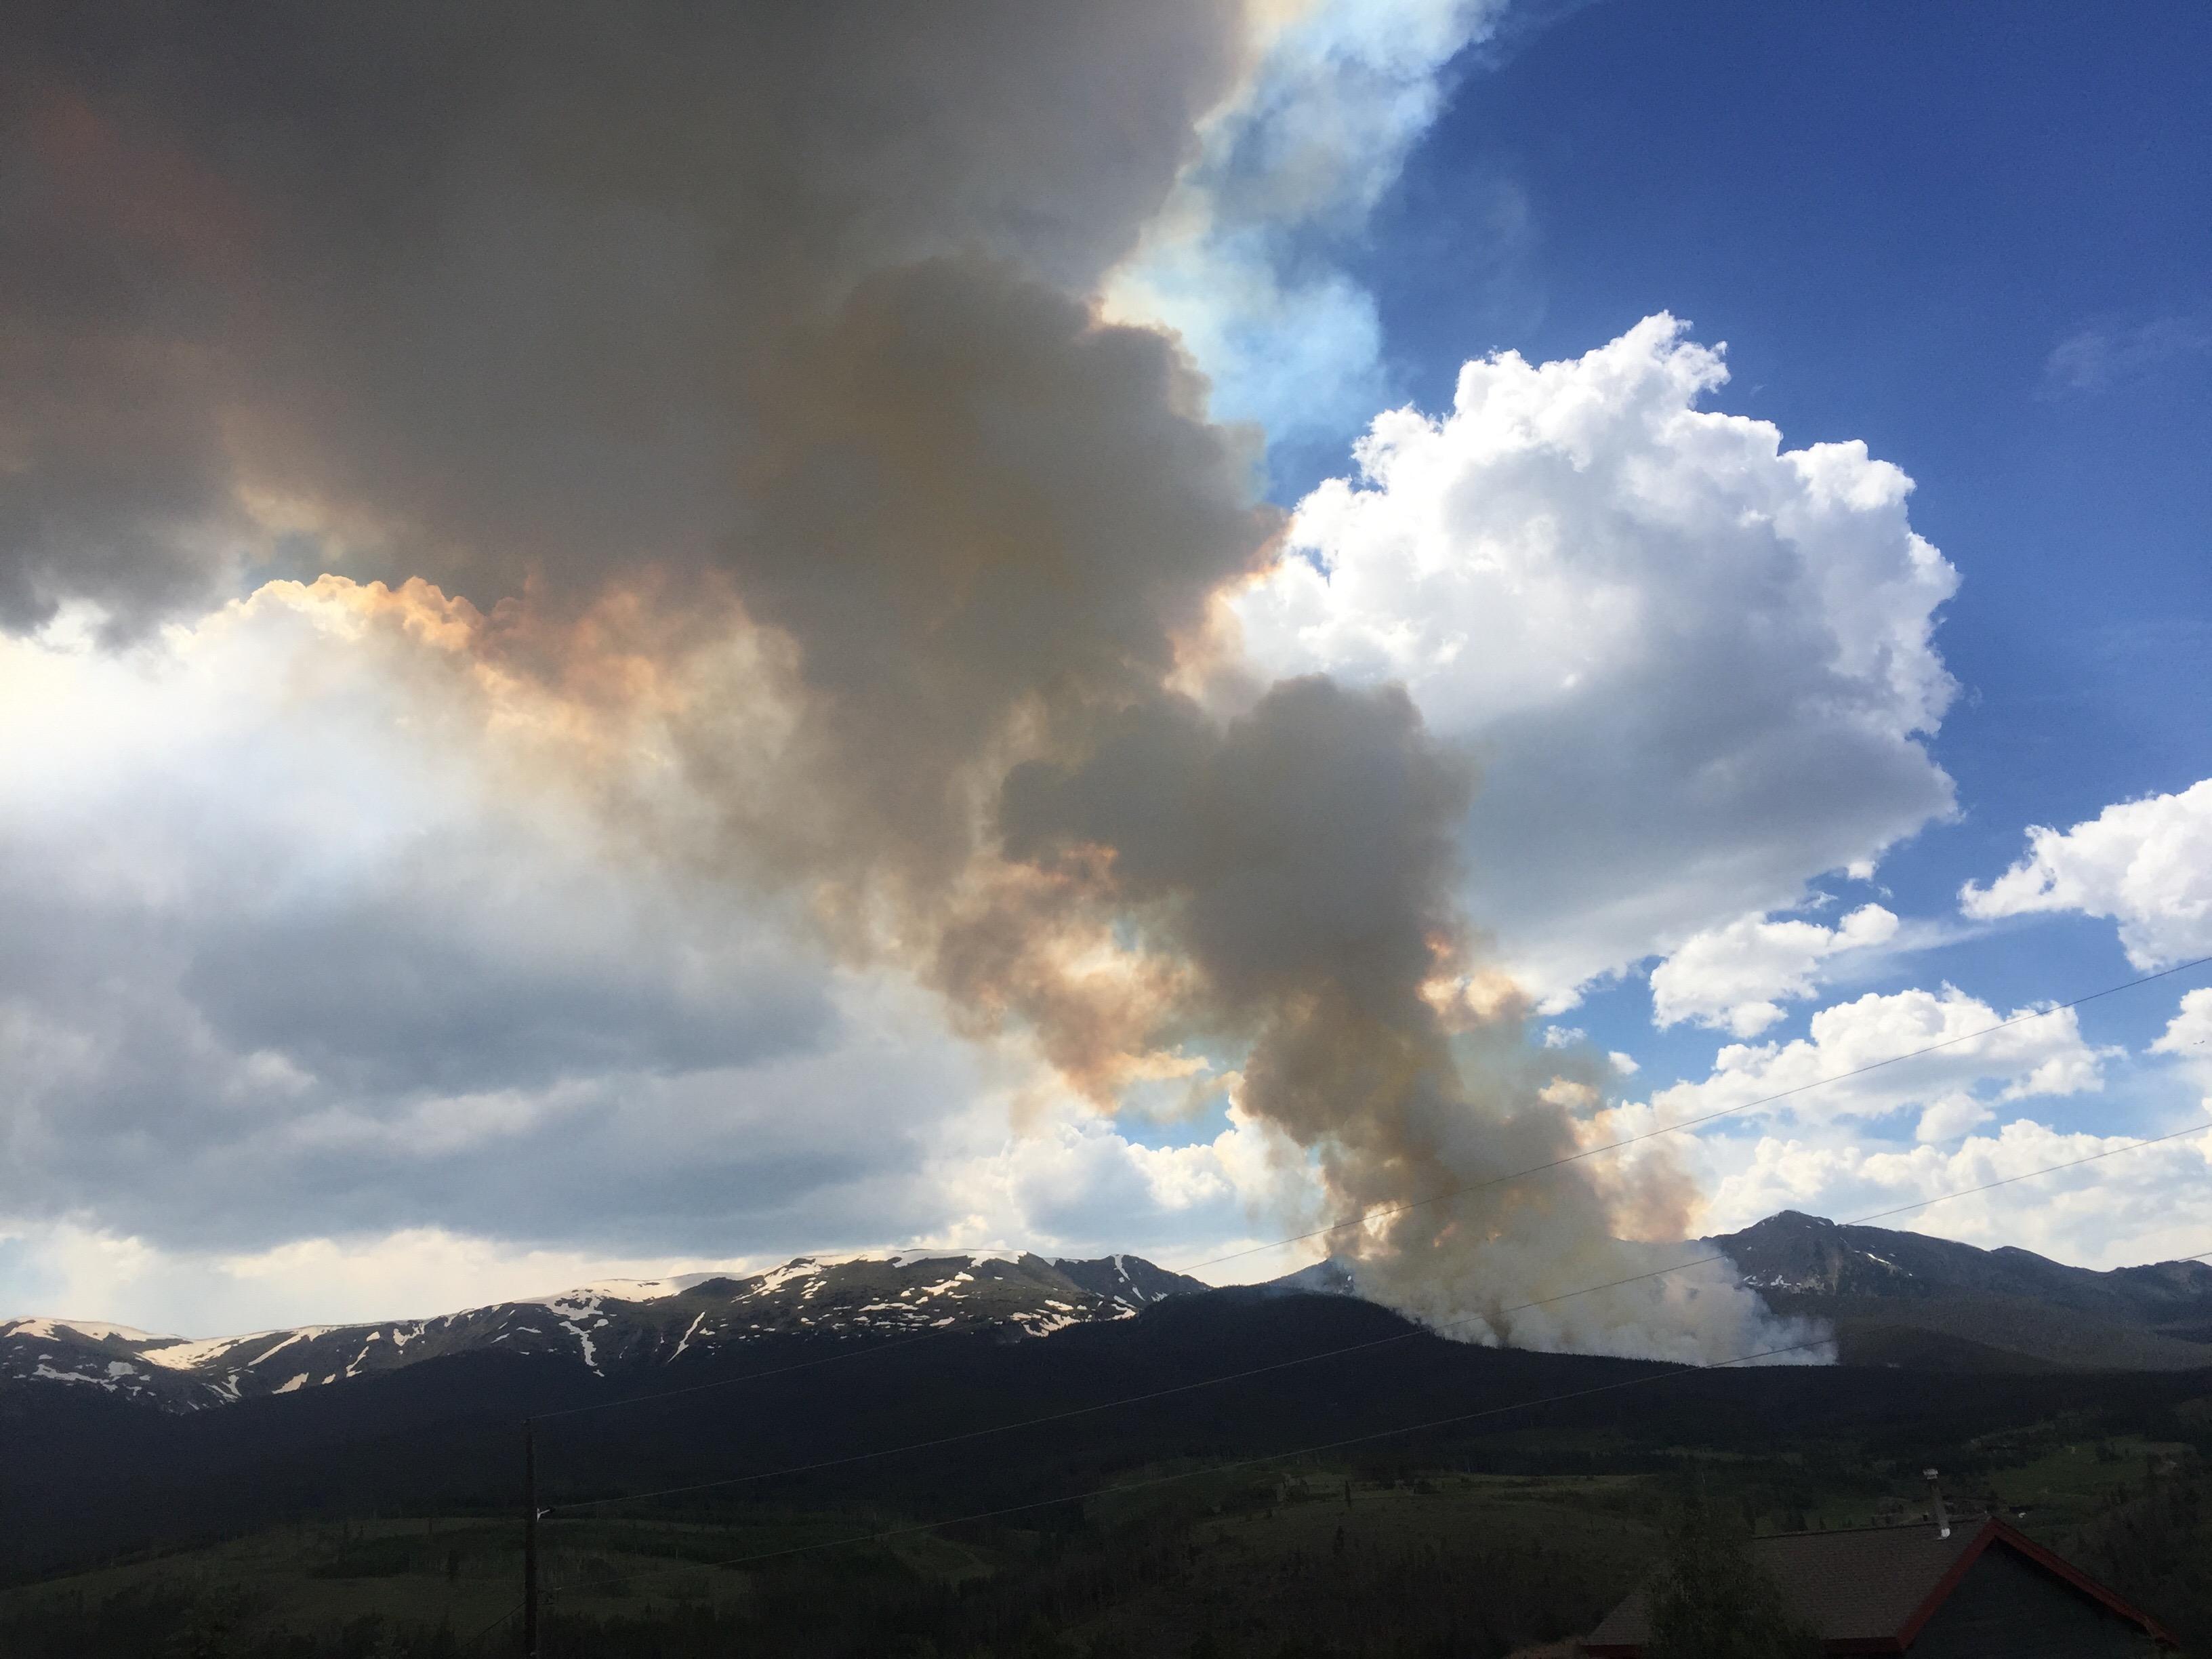 Photo: Breckenridge Wildfire 1 | Peak 2, July 5 - Inciweb